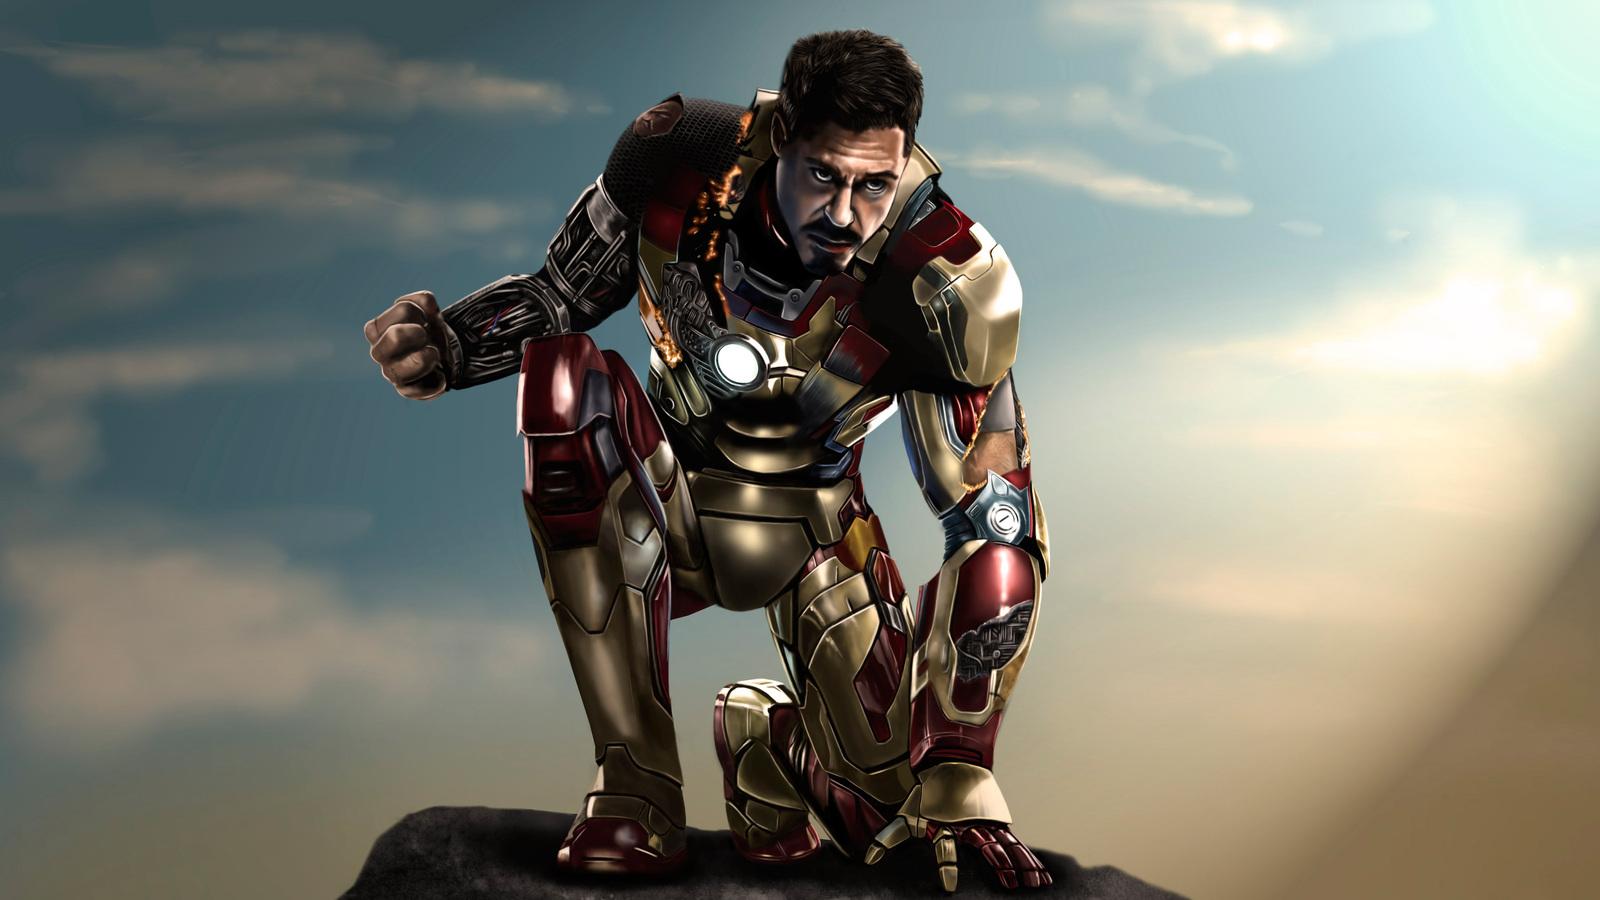 1600x900 Iron Man 3 Artwork 5k 1600x900 Resolution Hd 4k